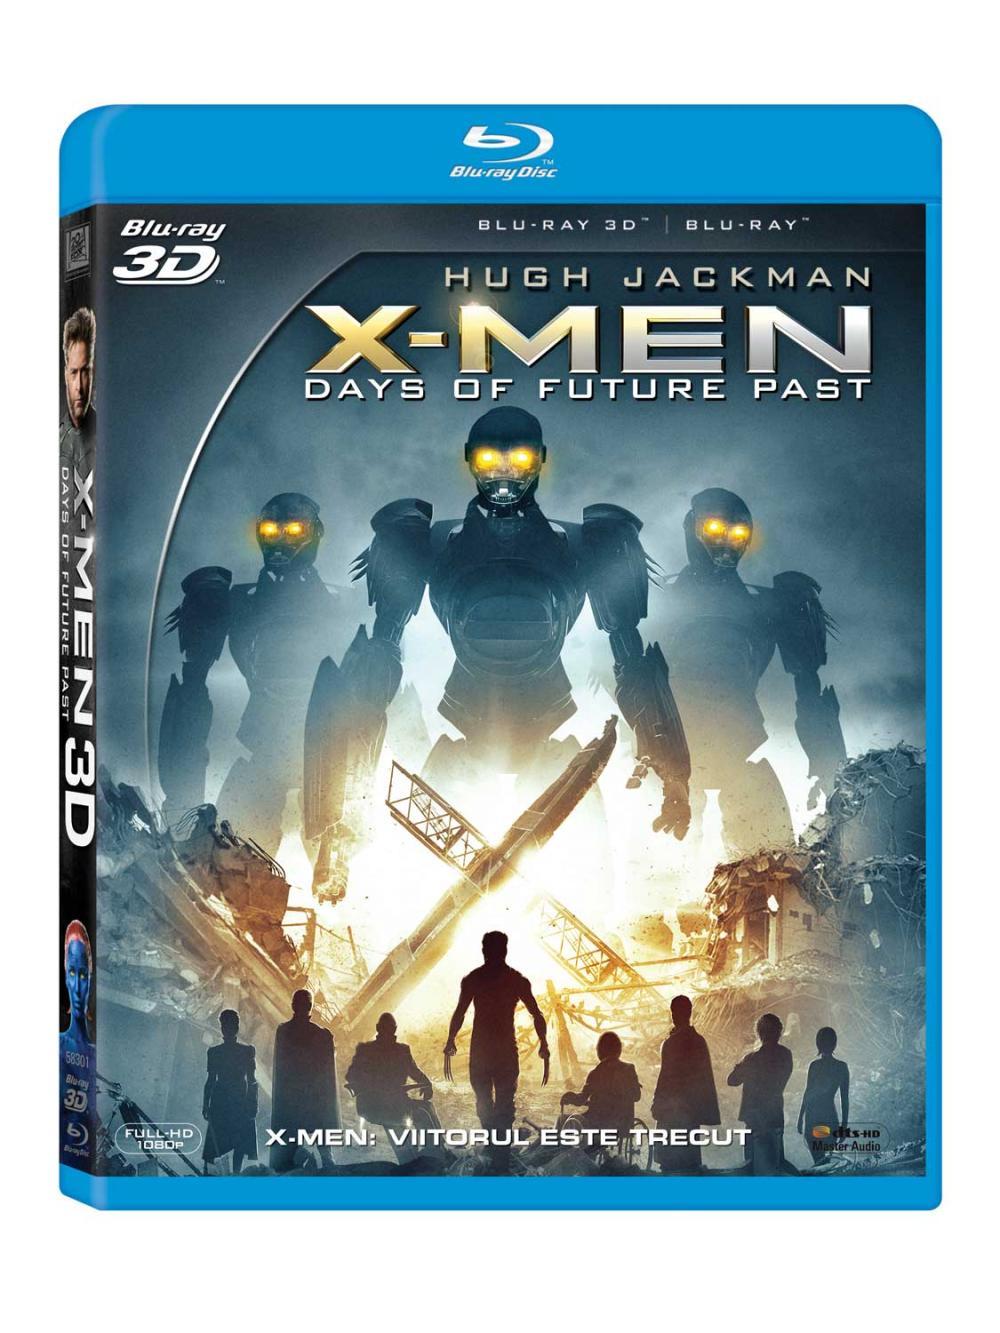 BD: X-MEN: DAYS OF FUTURE PAST - X-MEN: VIITORUL ESTE TRECUT